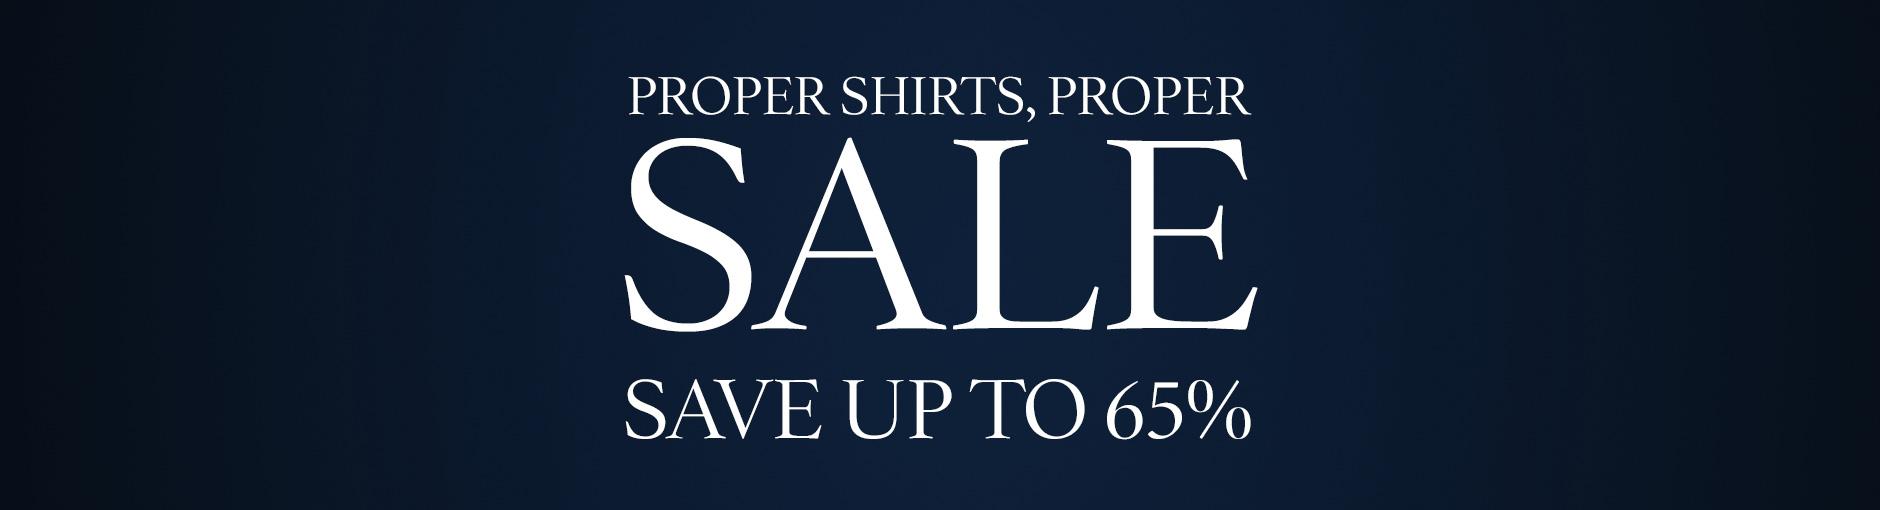 Charles Tyrwhitt Menswear Sale